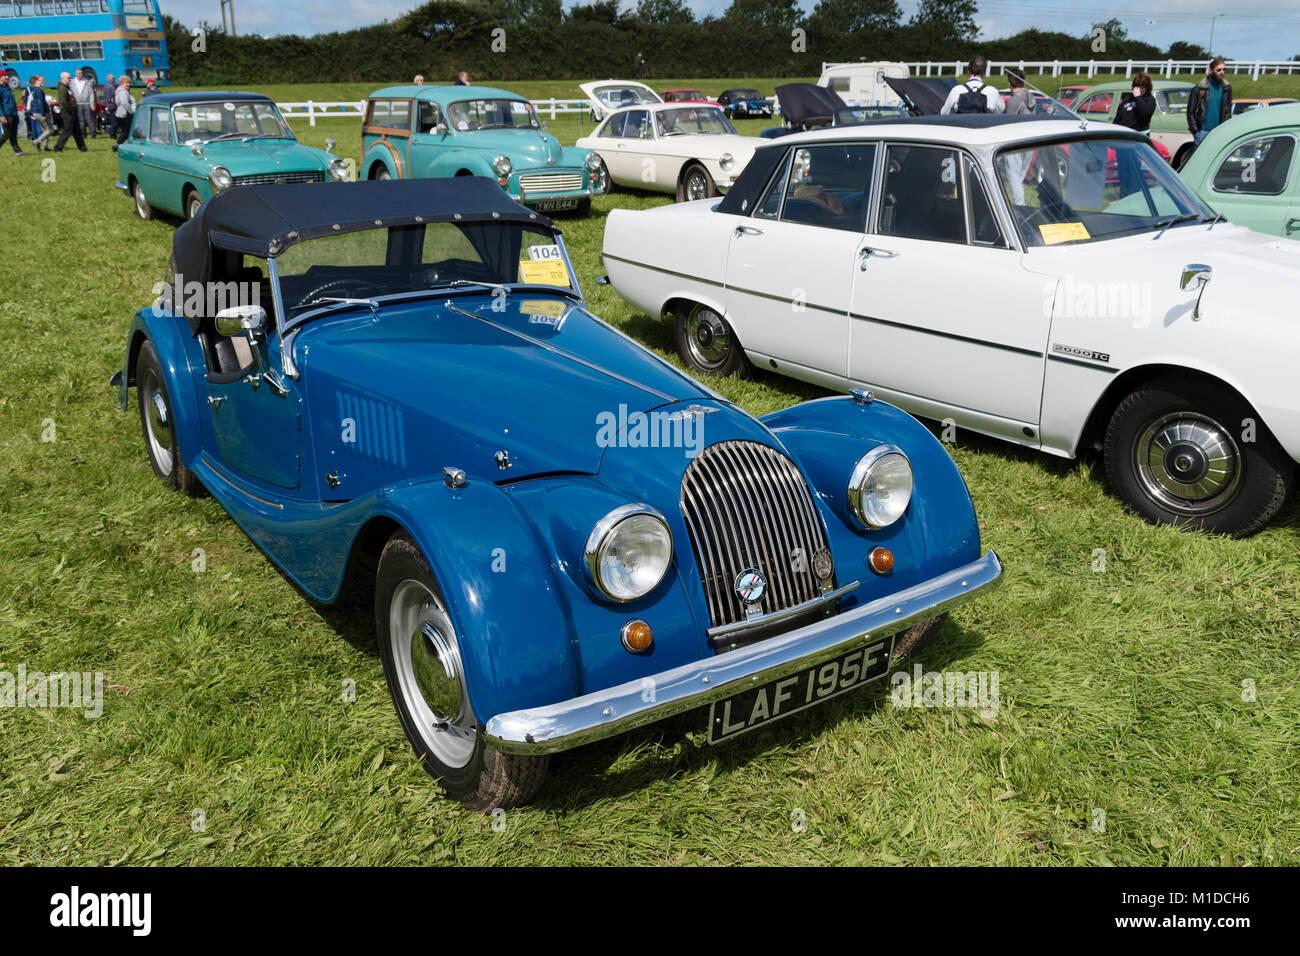 vintage morgan sports car - Stock Image